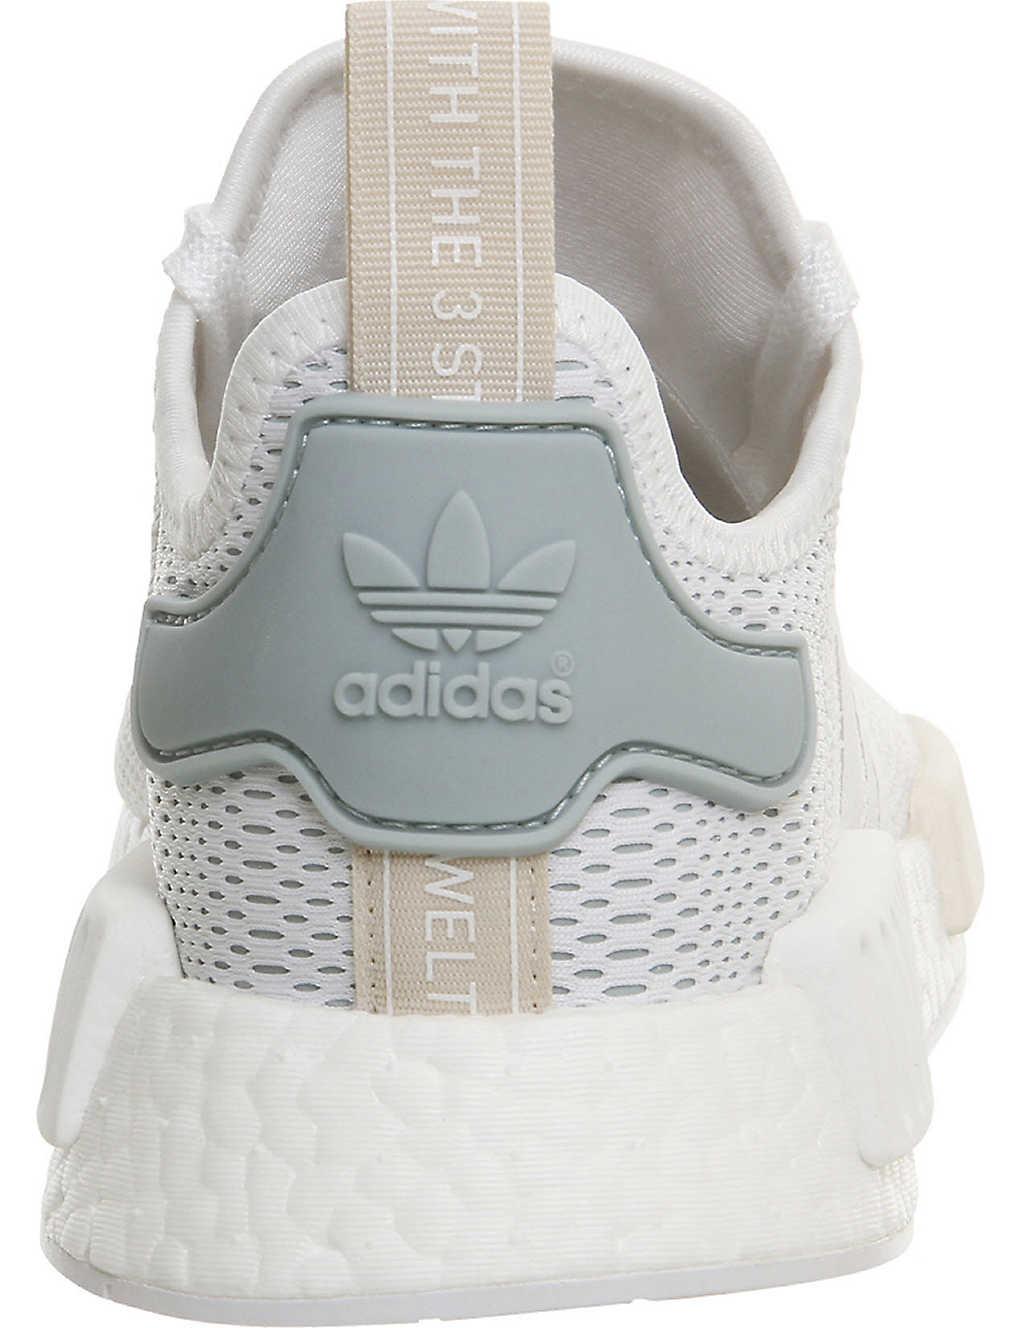 84bb2986686 ADIDAS - NMD lace-up primeknit trainers | Selfridges.com